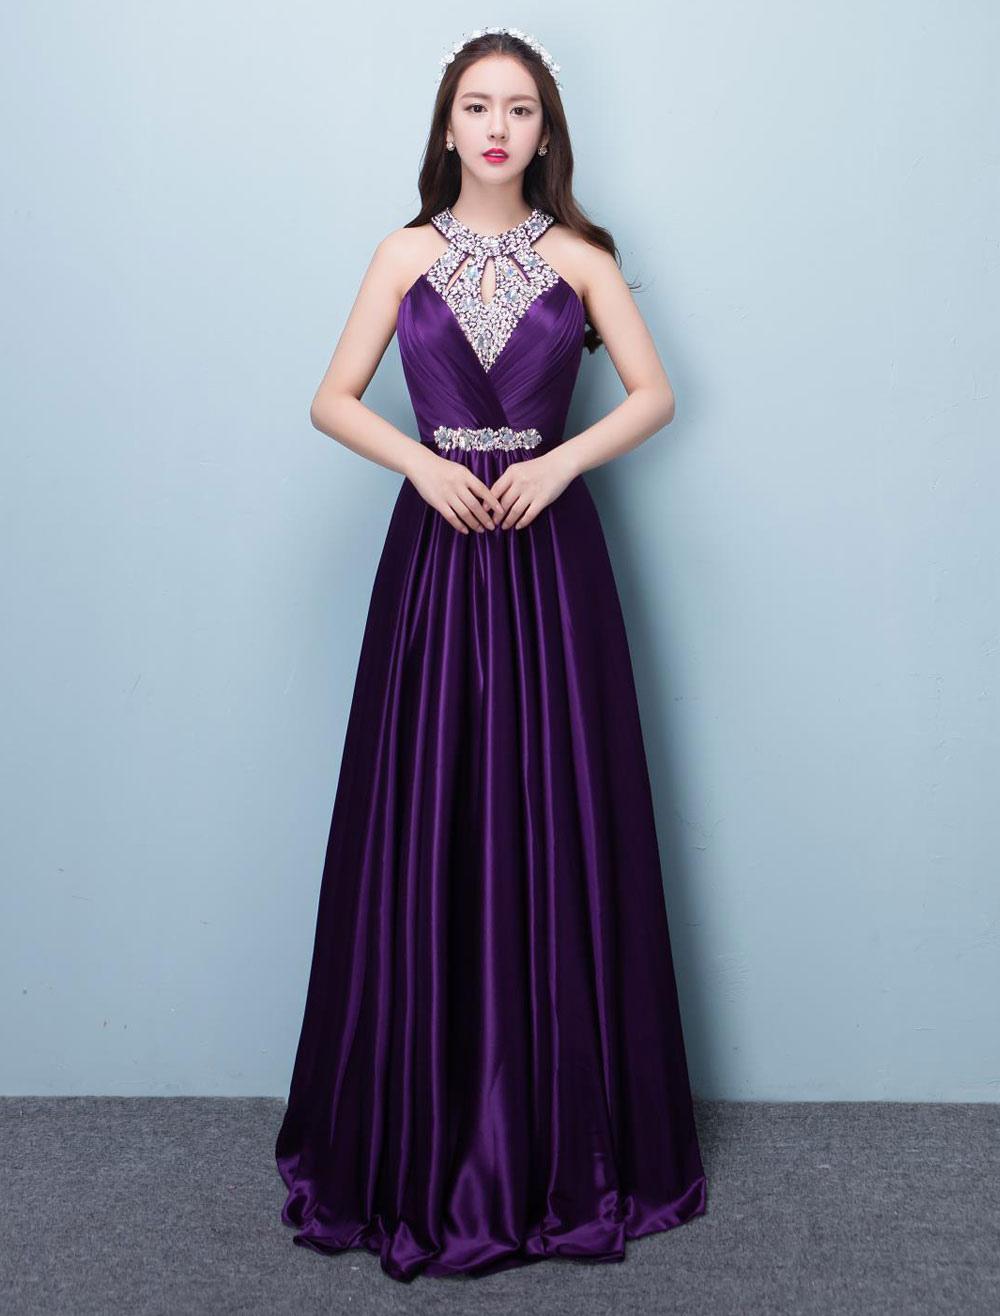 Prom Dresses Long Lavender Satin Beaded Halter Backless Floor Length Formal Occasion Dress (Wedding Cheap Party Dress) photo